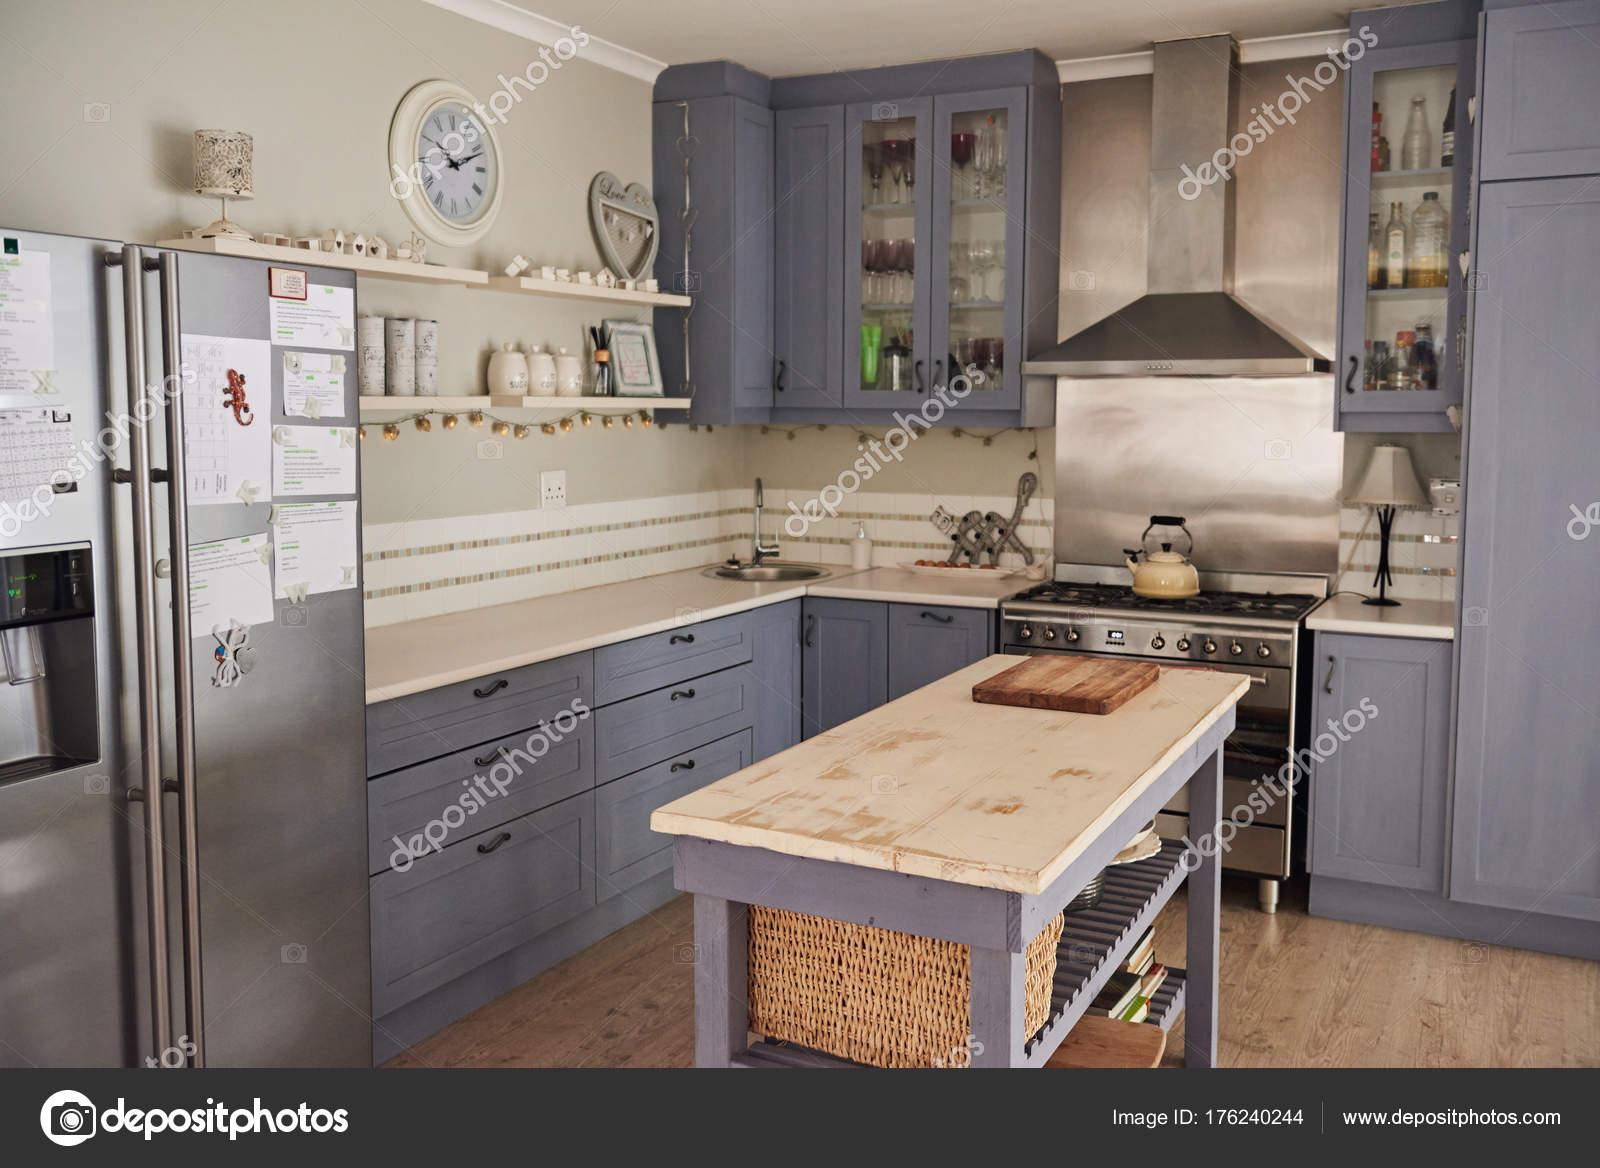 Case Stile Countryfoto : Cucina in stile country u foto stock mavoimages